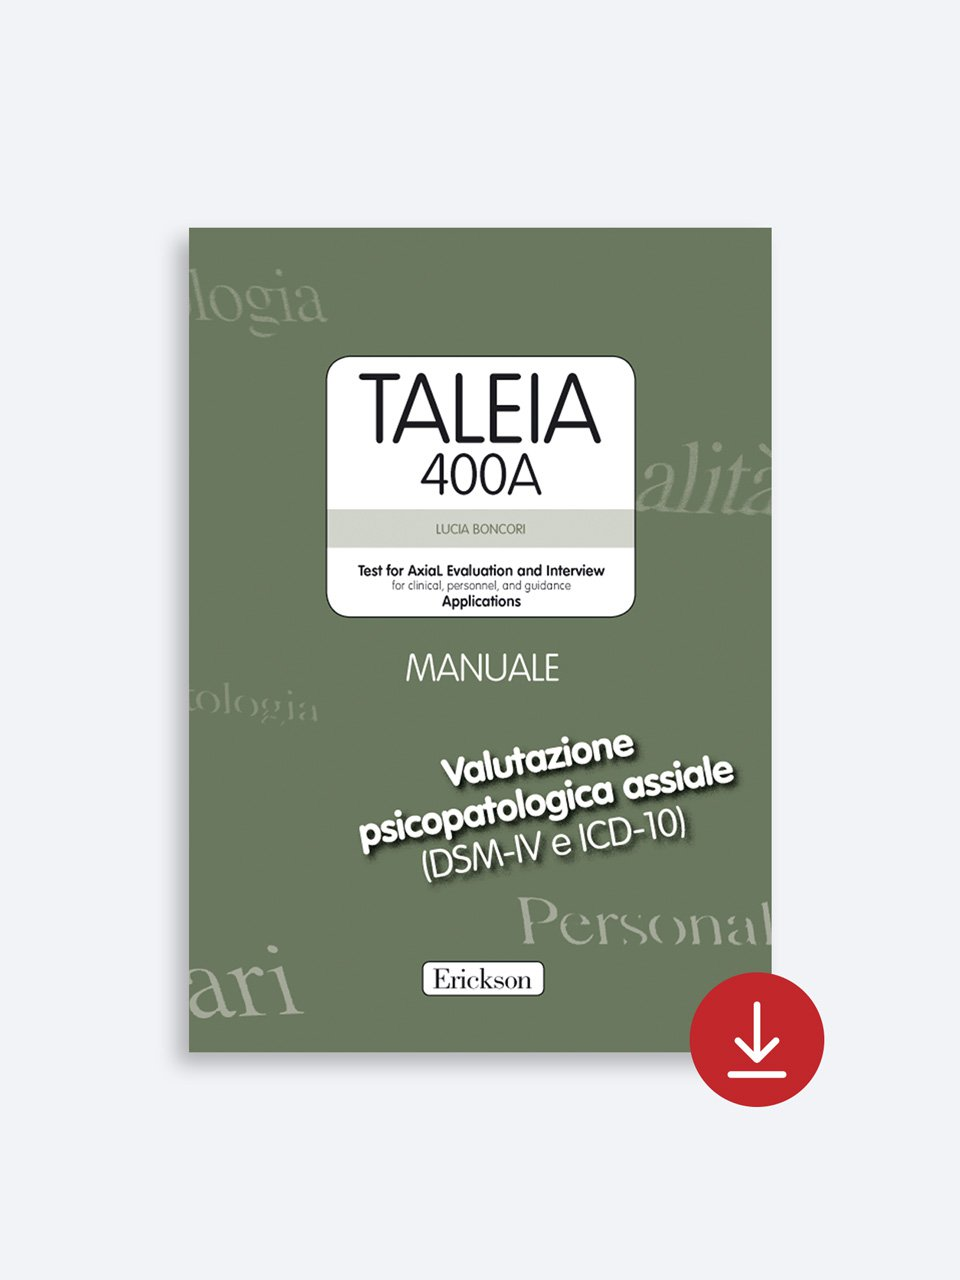 TALEIA-400A - Test for Axial Evaluation and Interv - Libri - App e software - Strumenti - Erickson 3